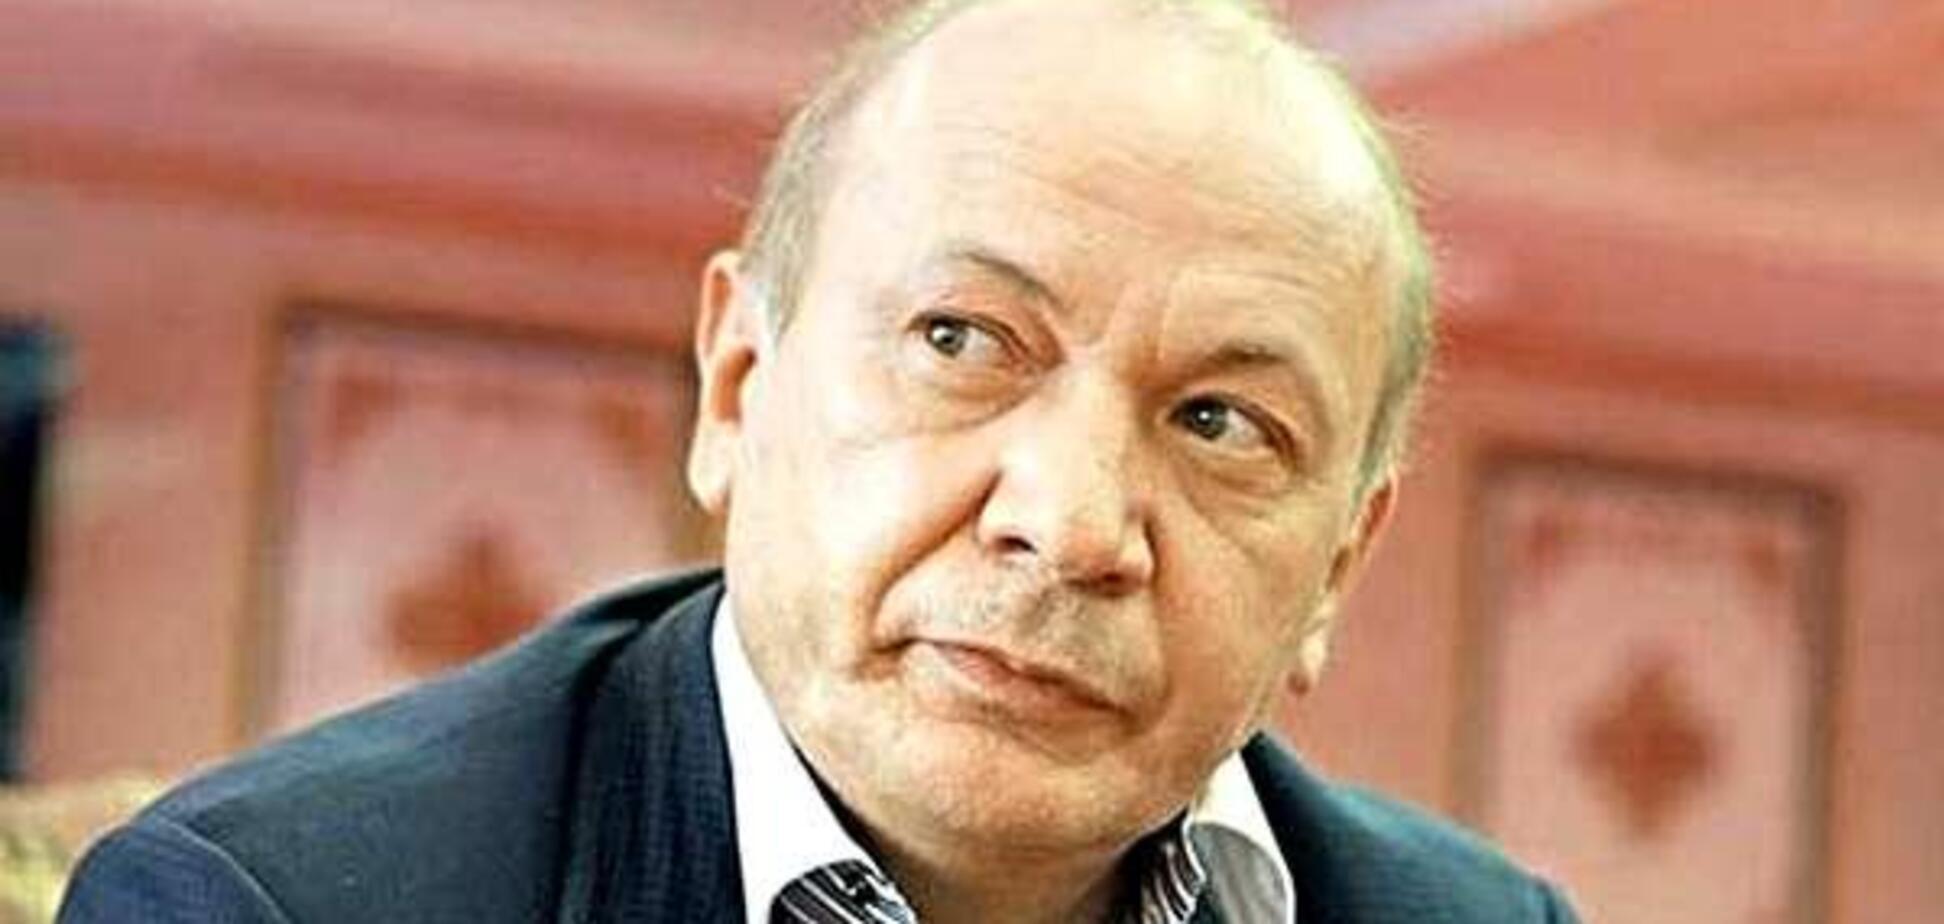 Европейский суд снял санкции с Иванющенко, но отказал Клименко